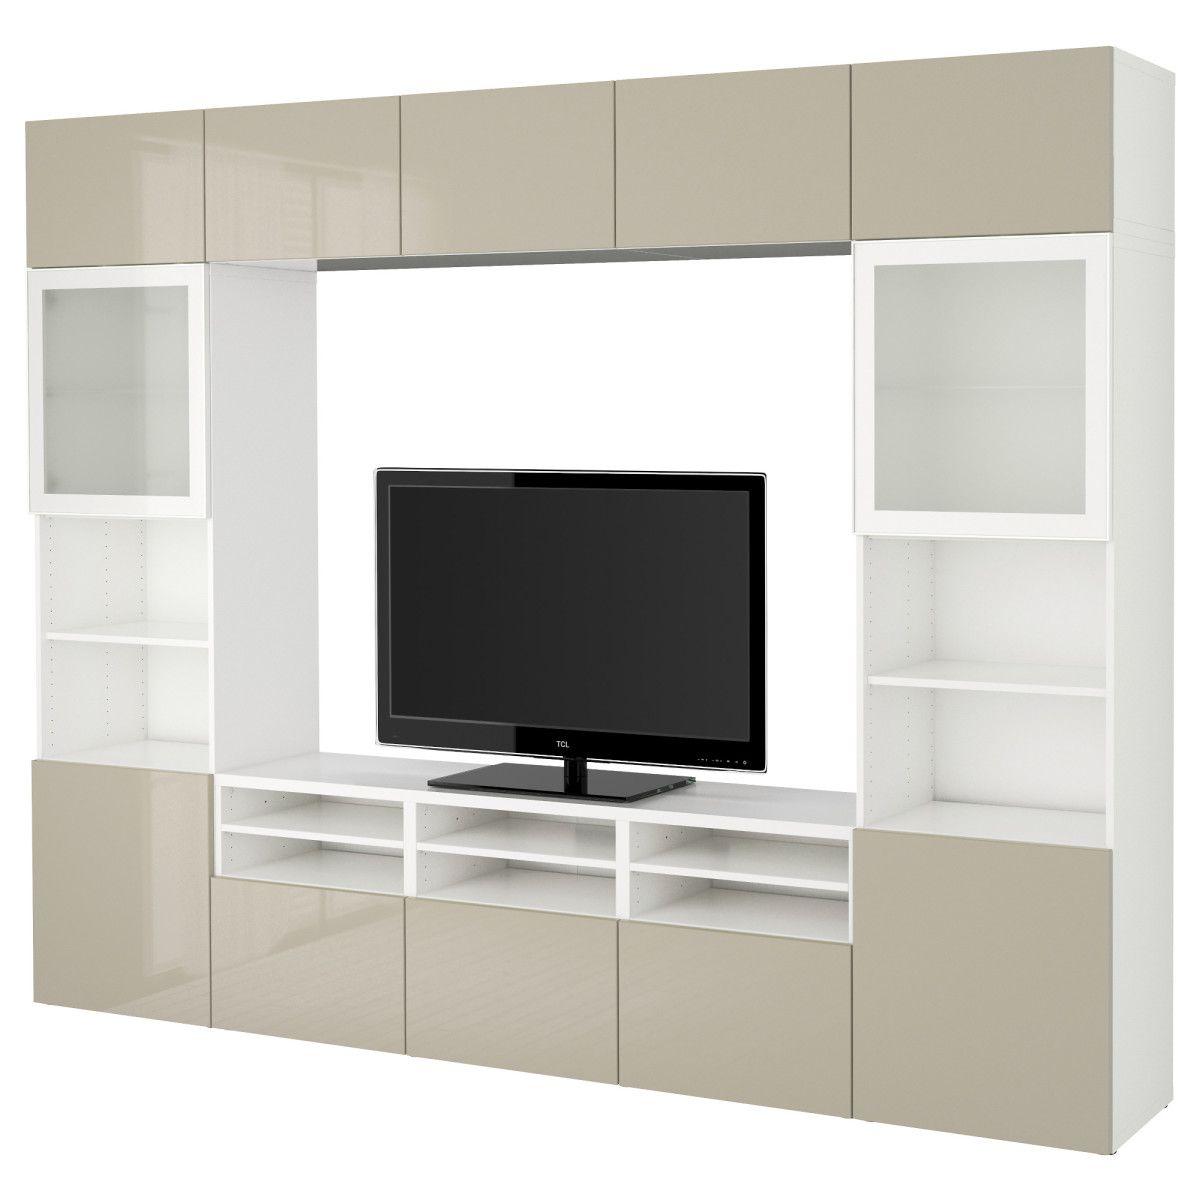 Pin On Ikea Tv Wall Unit